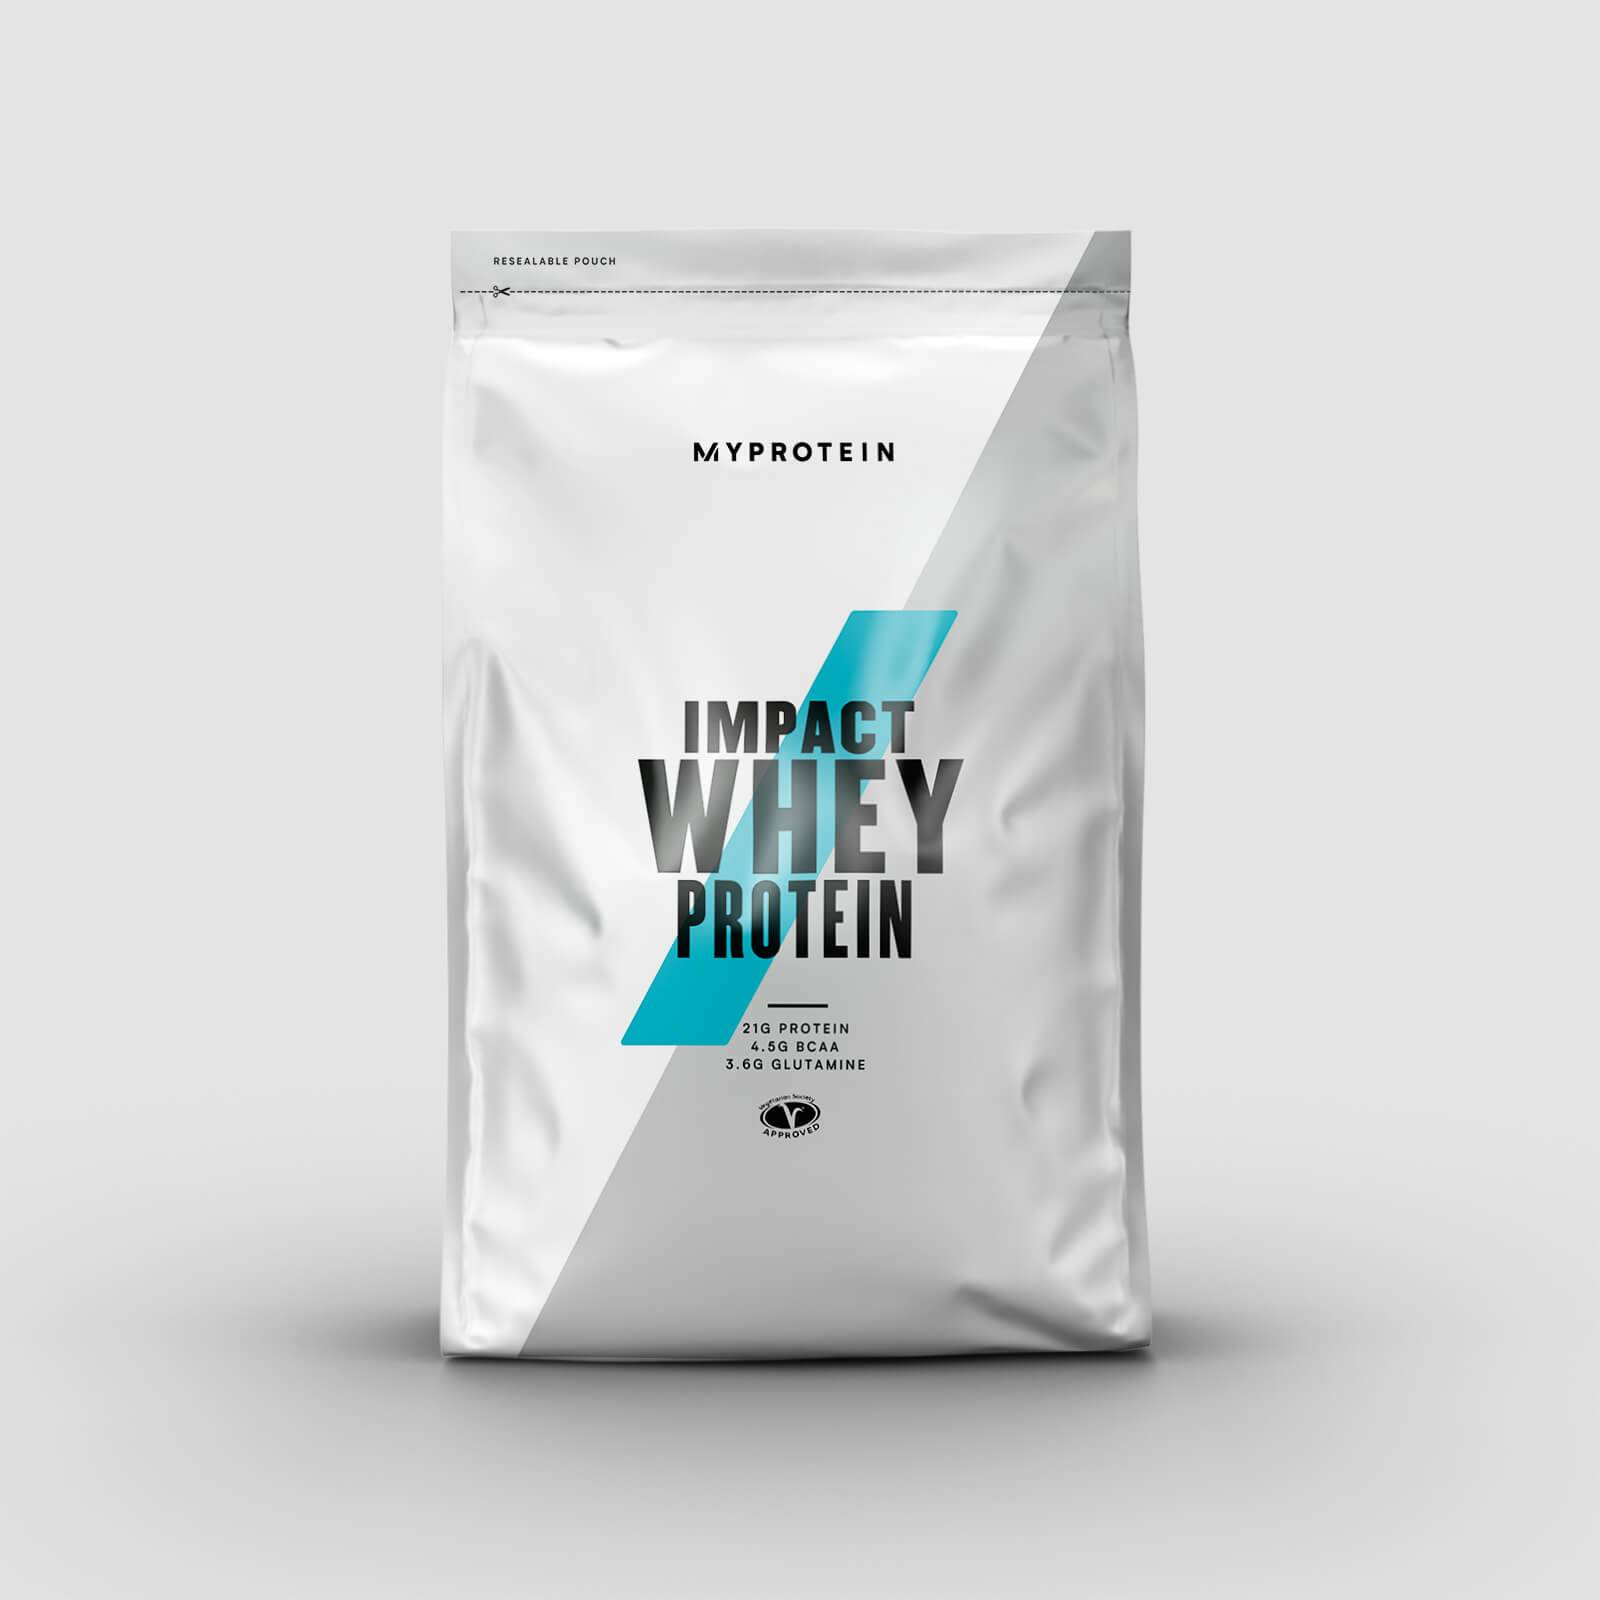 Myprotein Impact Whey Protein - 5kg - Banane caramélisée